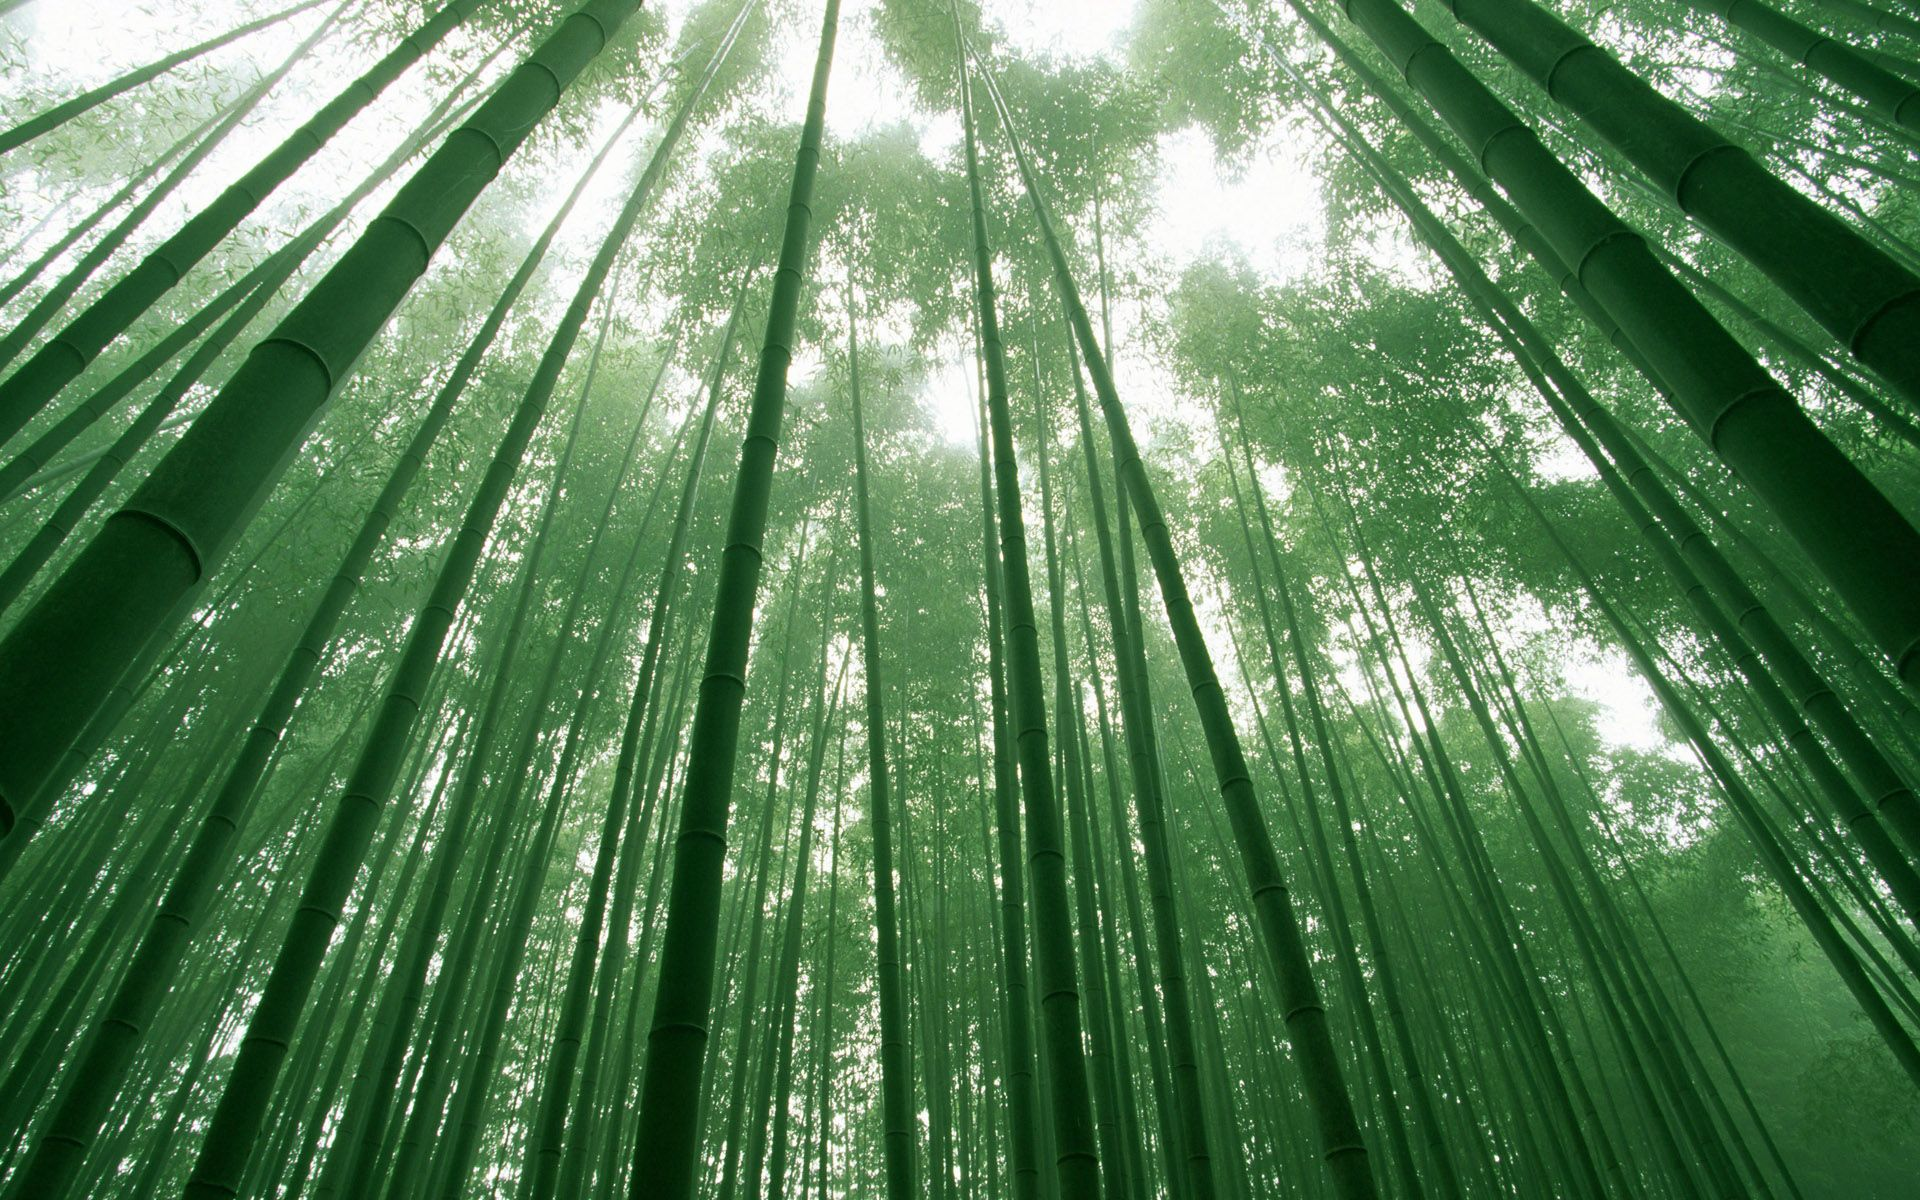 Bamboo Forest Wallpaper Hd Wallpaper Bamboo Forest Bamboo